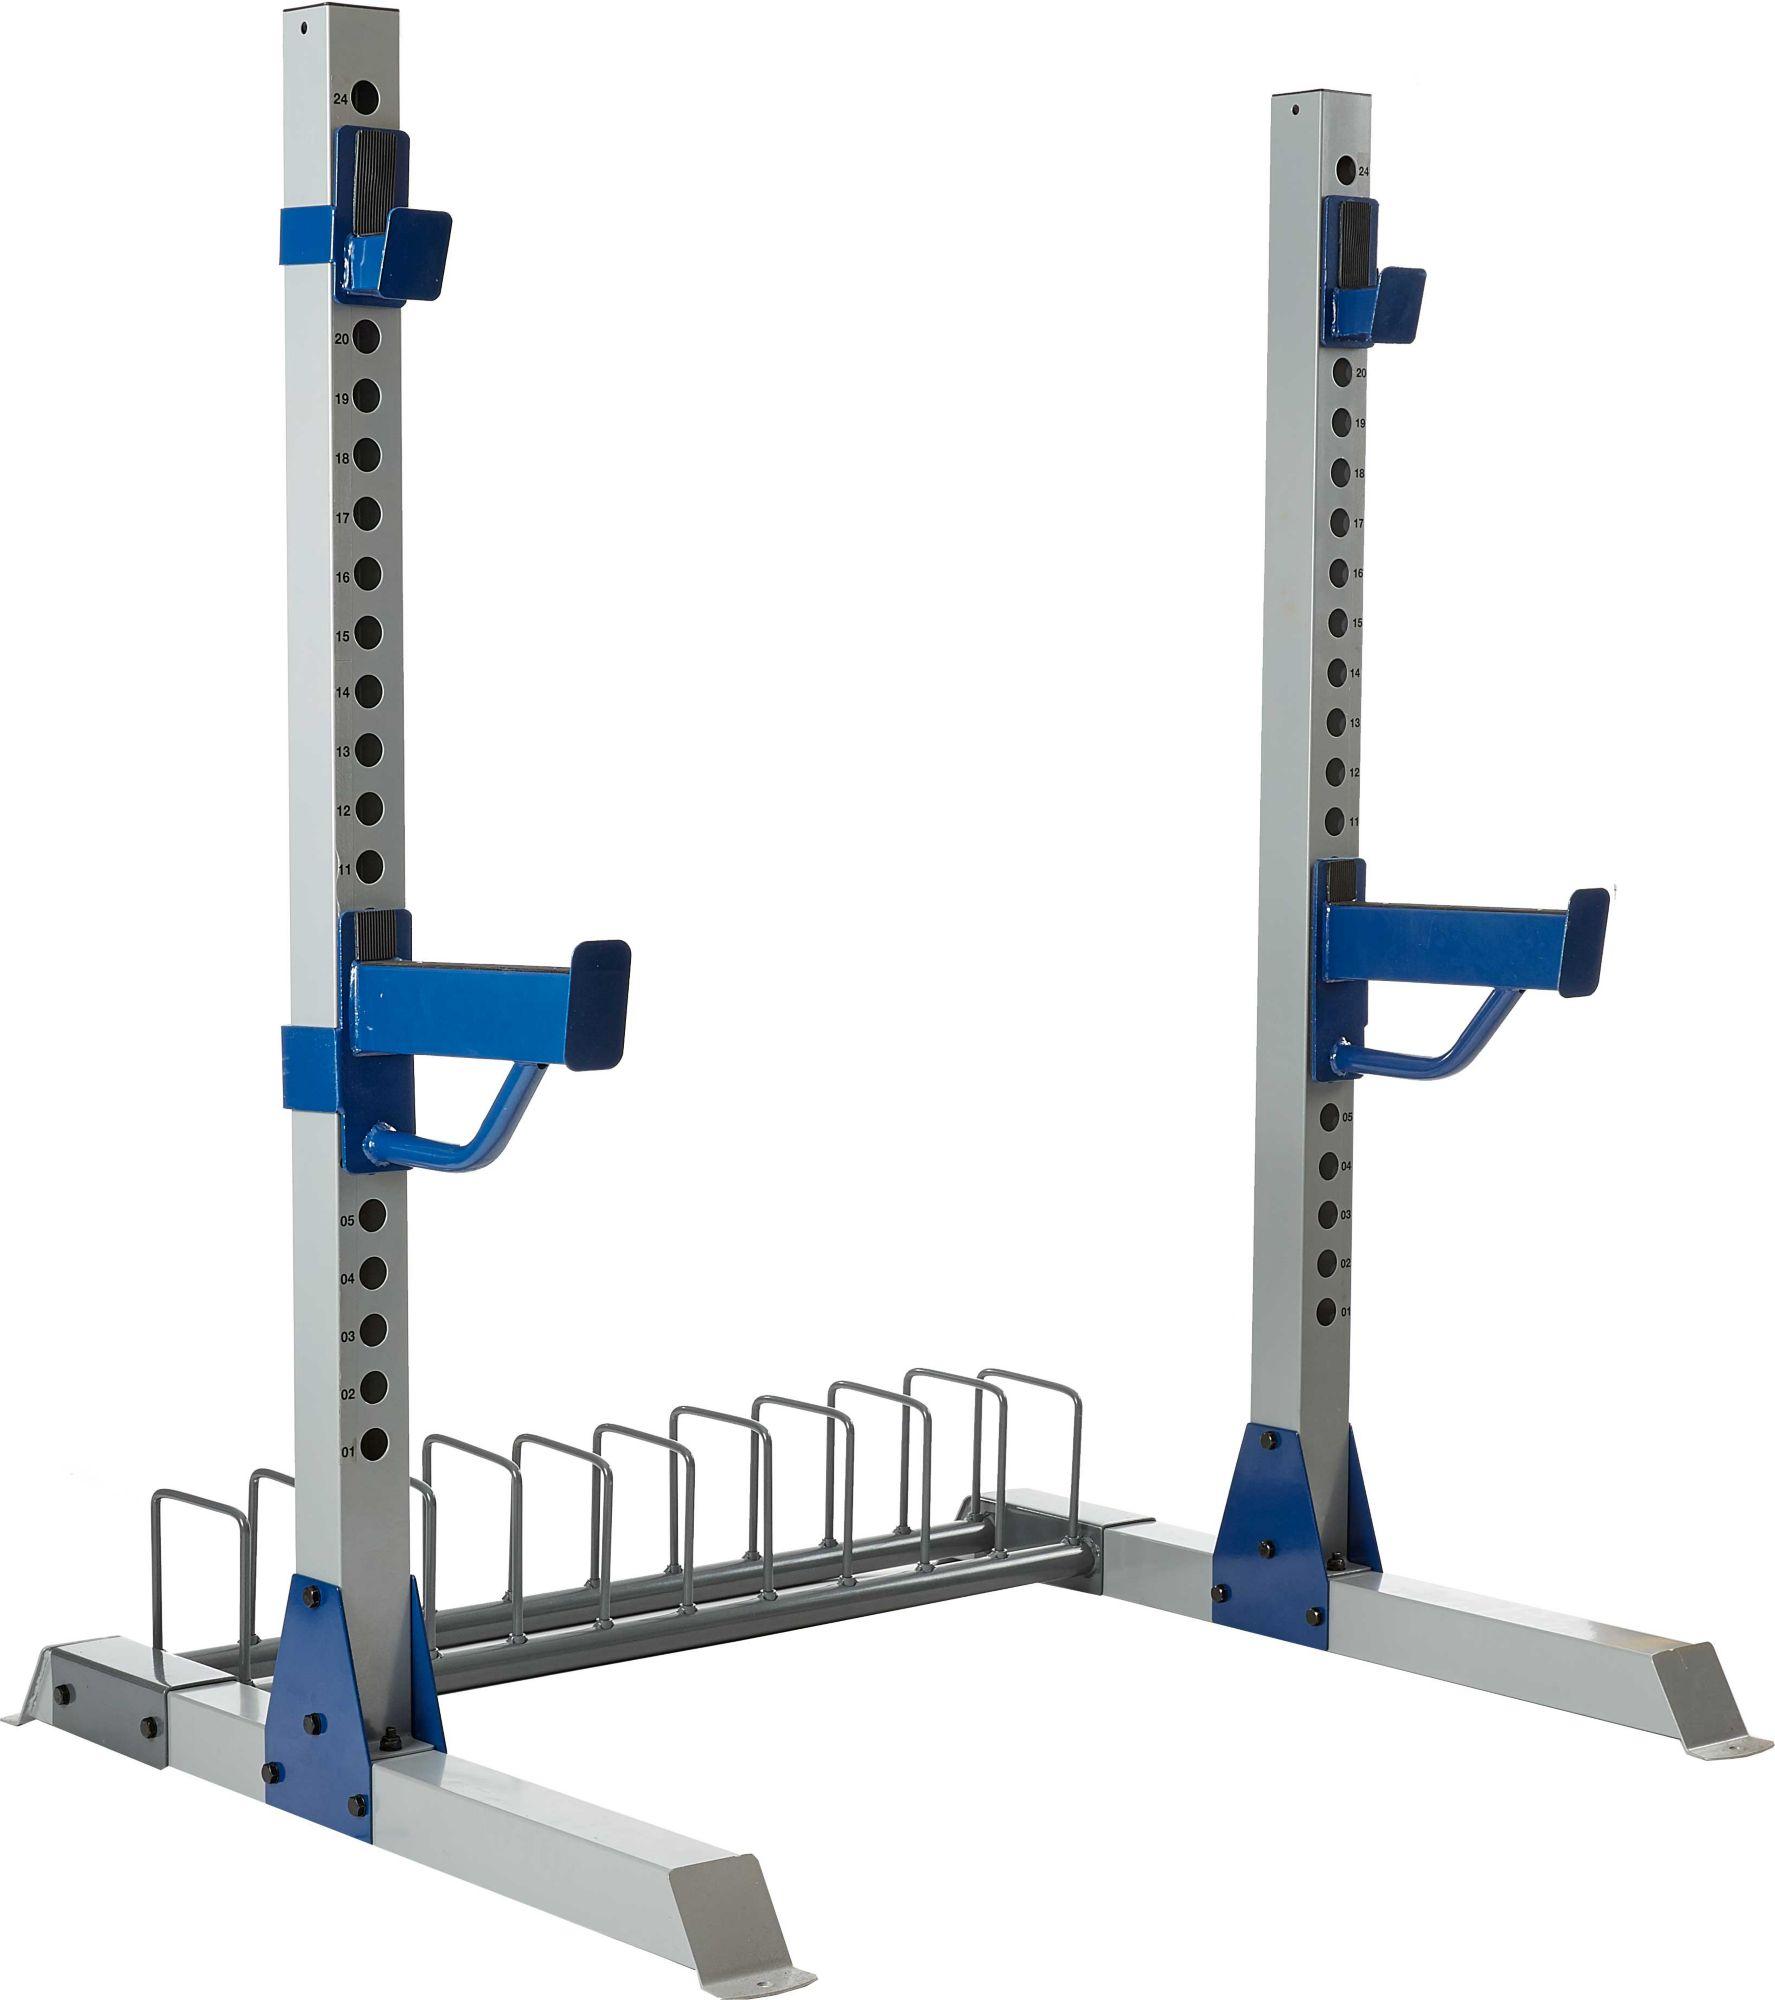 fitness-gear-brand-dicks-wisconsin